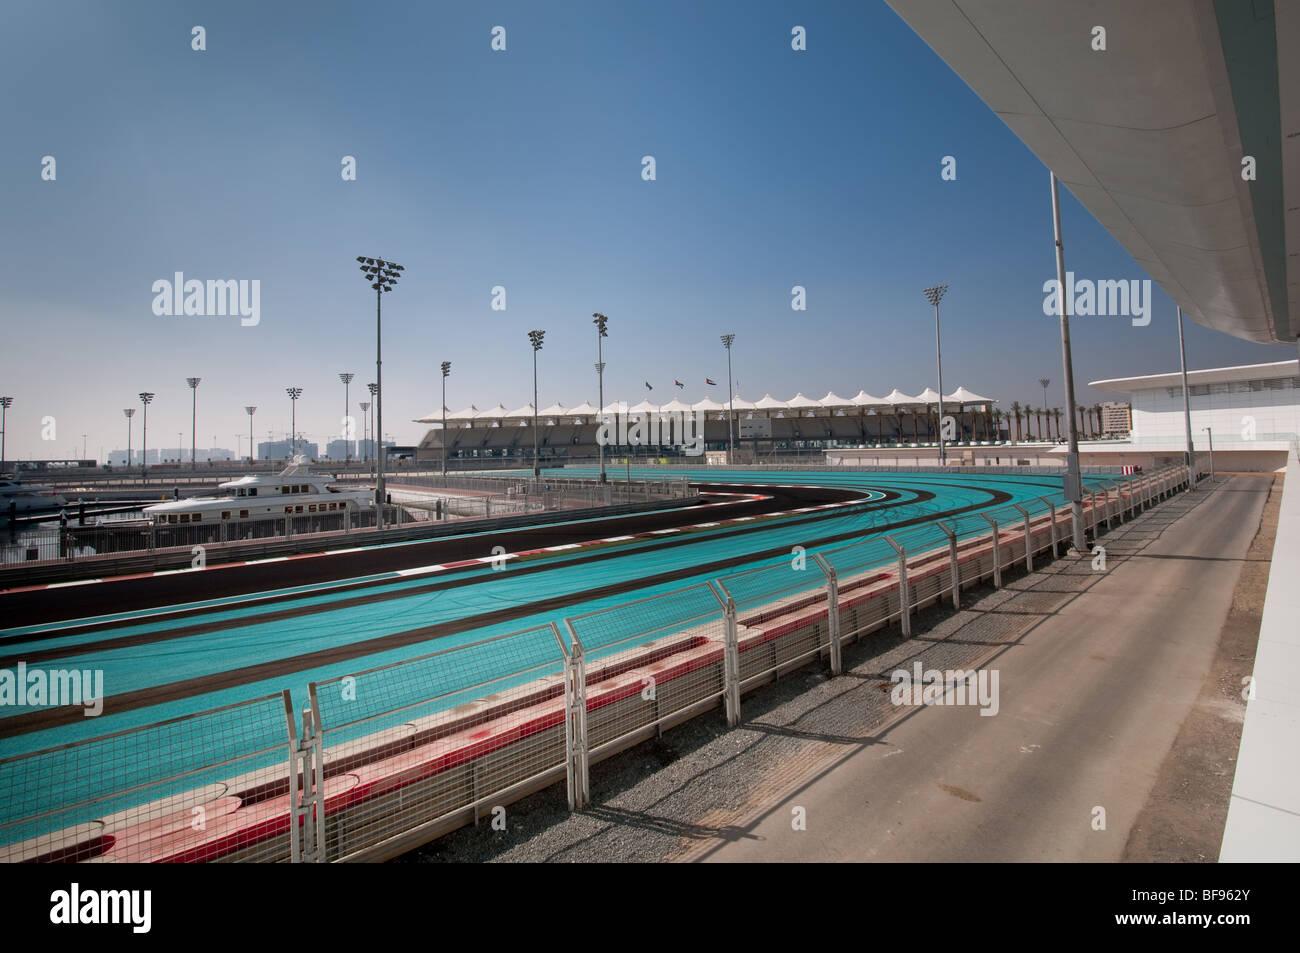 Abu Dhabi Yas Marina Formula 1 Grand Prix Race Track - Stock Image